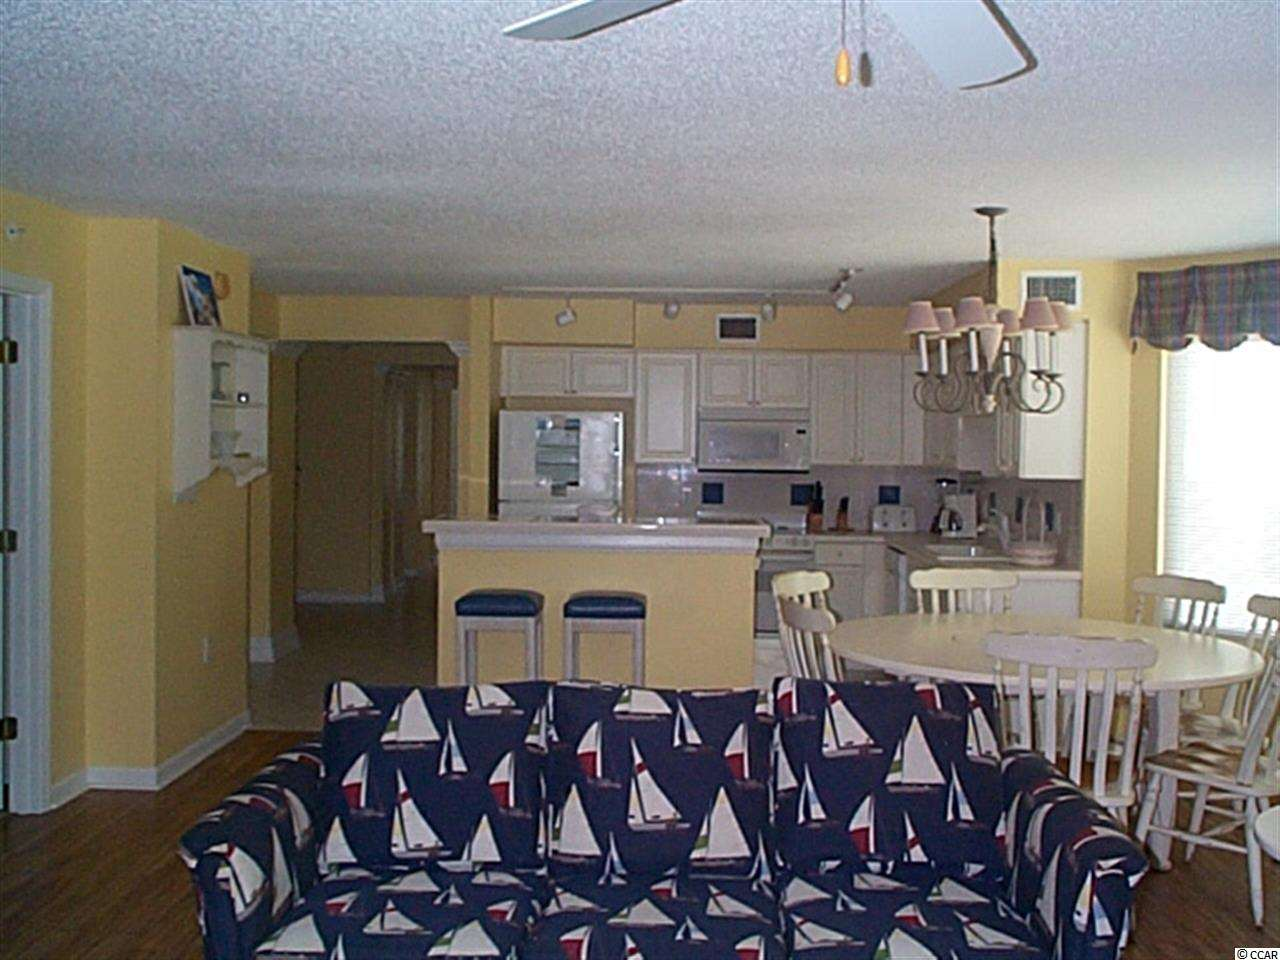 Crescent condo for sale in Pawleys Island, SC